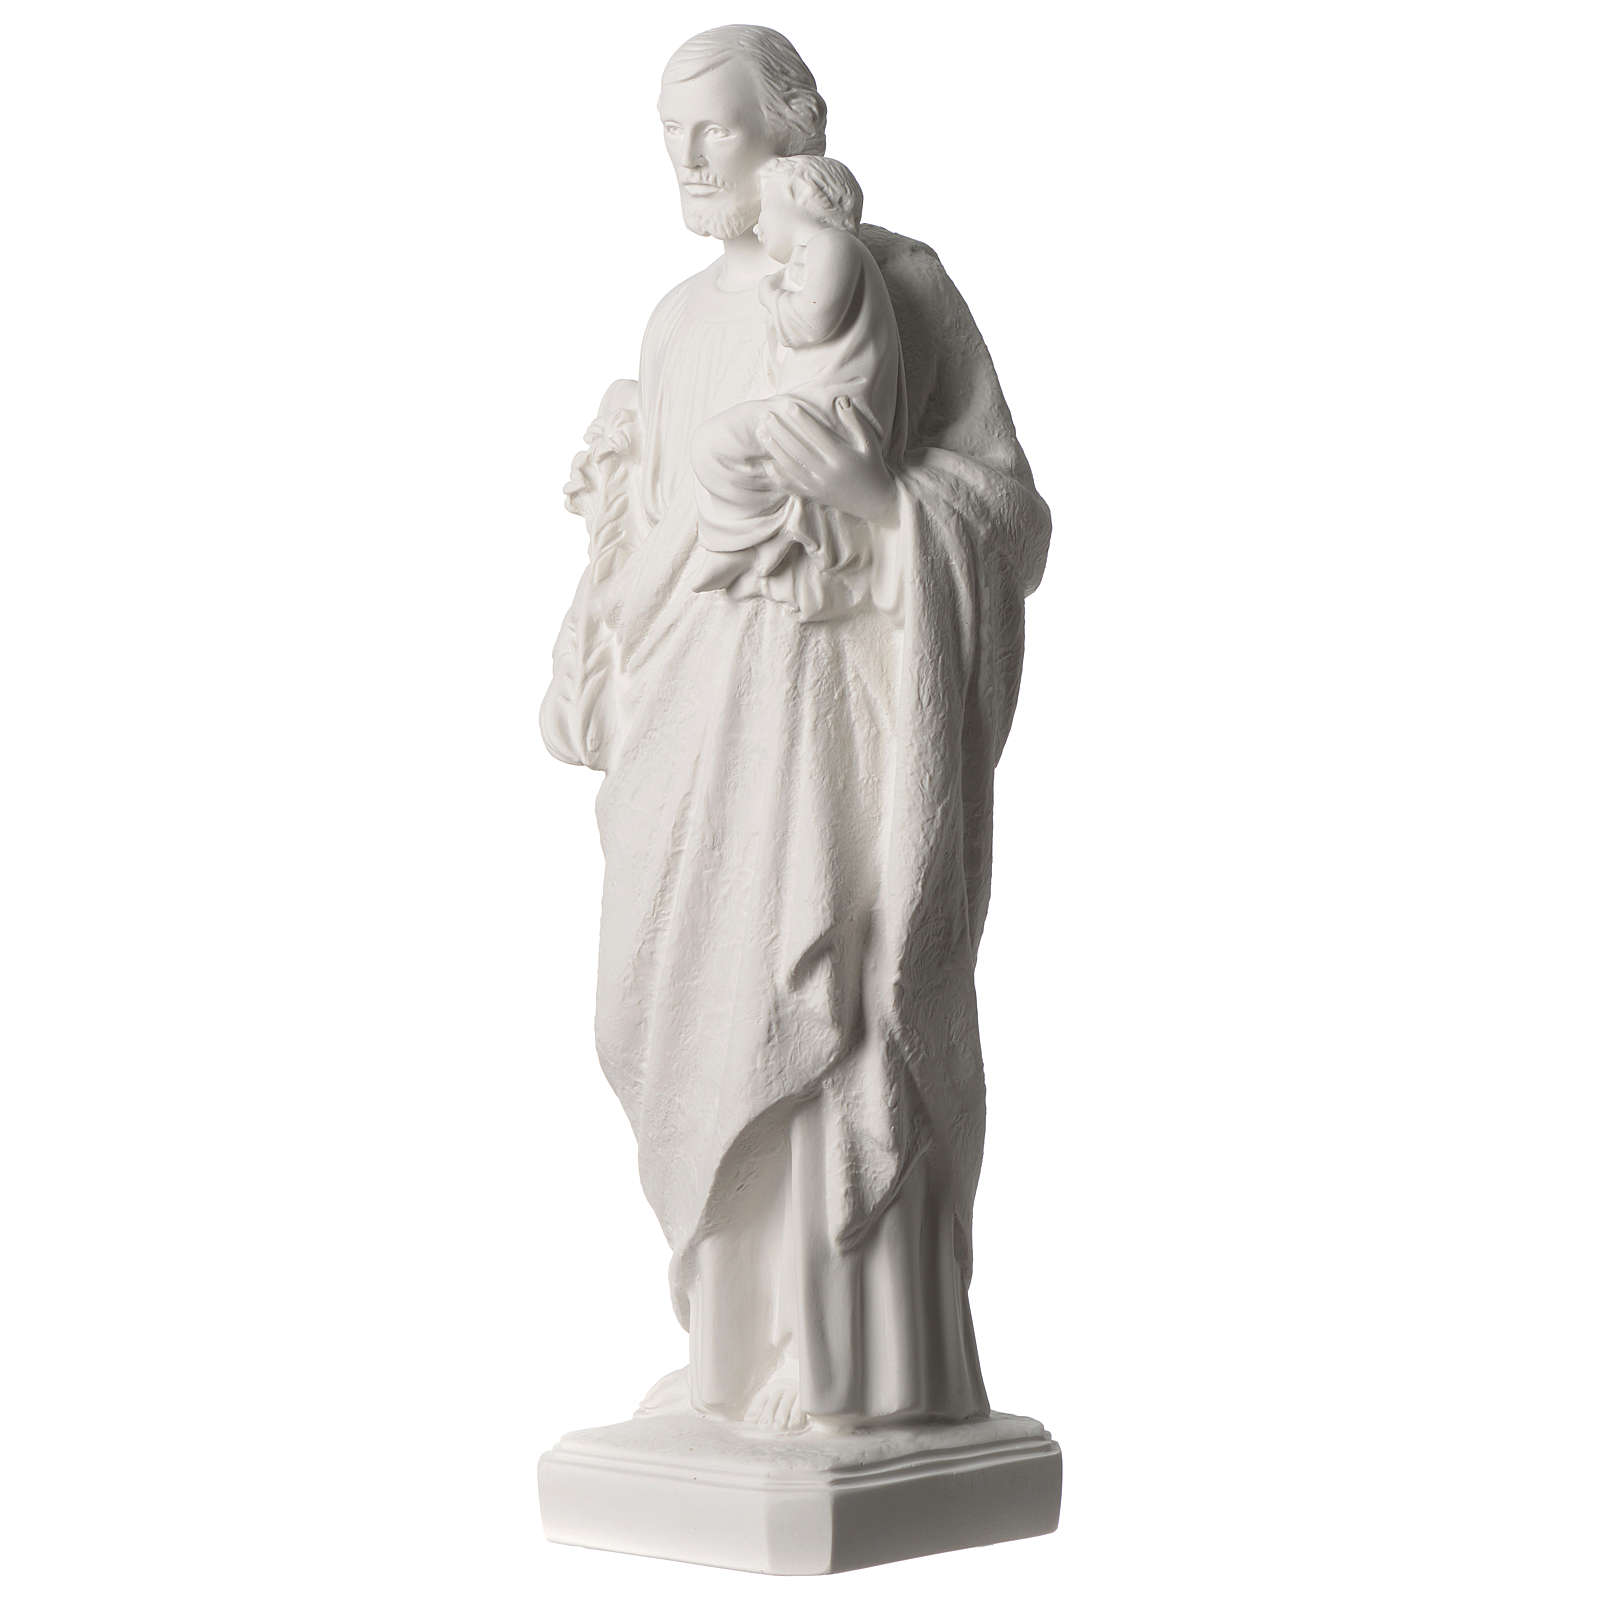 Saint Joseph white marble statue 19.5 inches 4